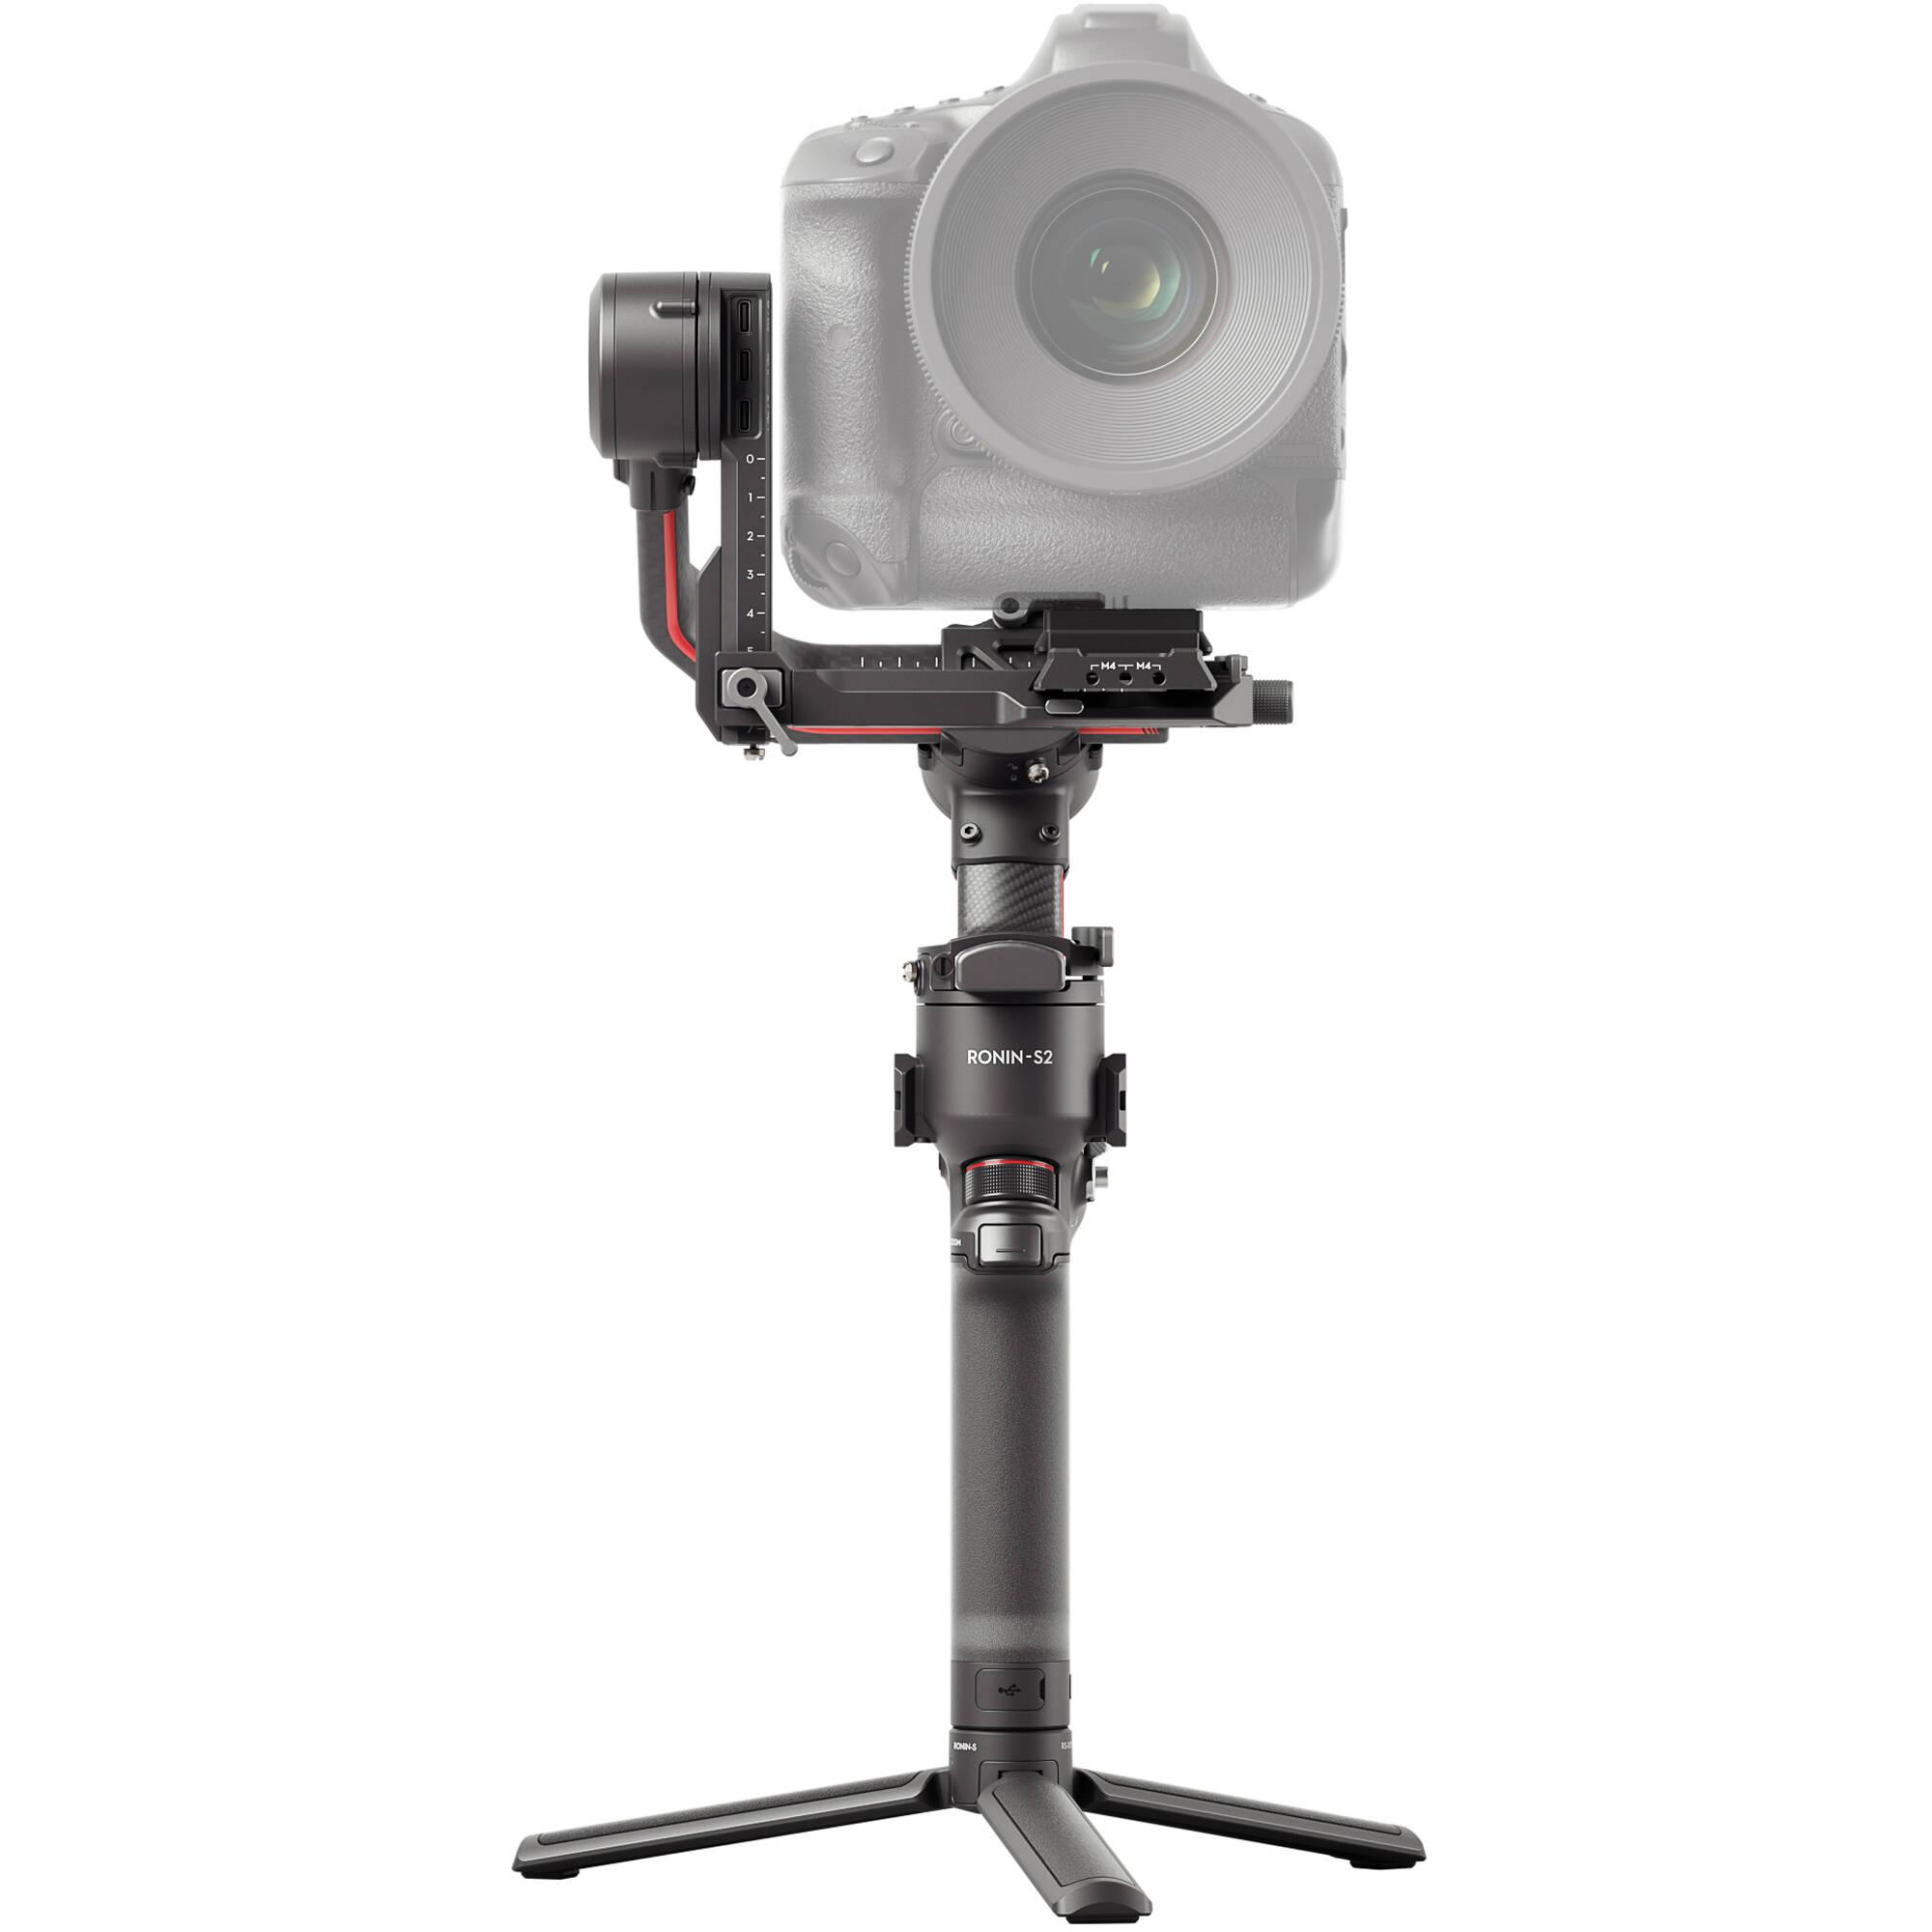 استابلایزر دوربین DJI Ronin RS2